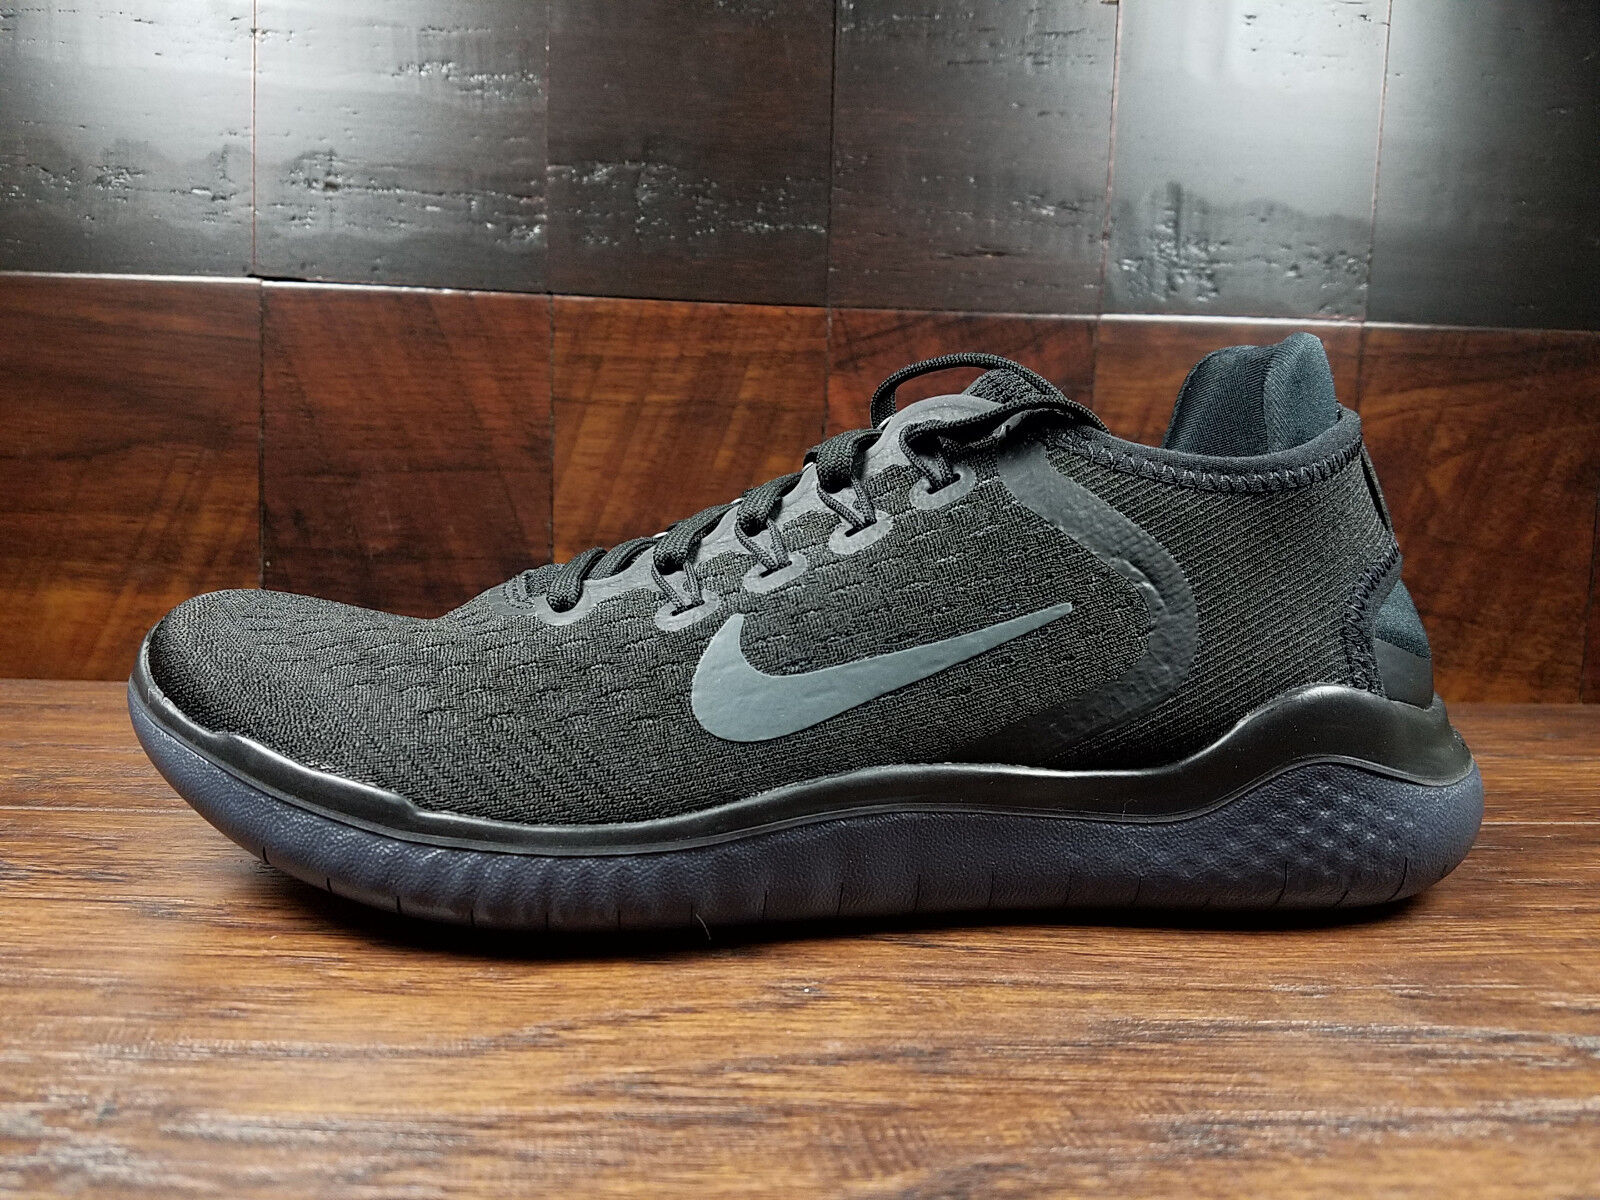 d0b10152cc Nike Free Run (Black Anthracite) [942837-002] Wmns Sz 6-10 Running 2018  nsfwxh3158-Athletic Shoes